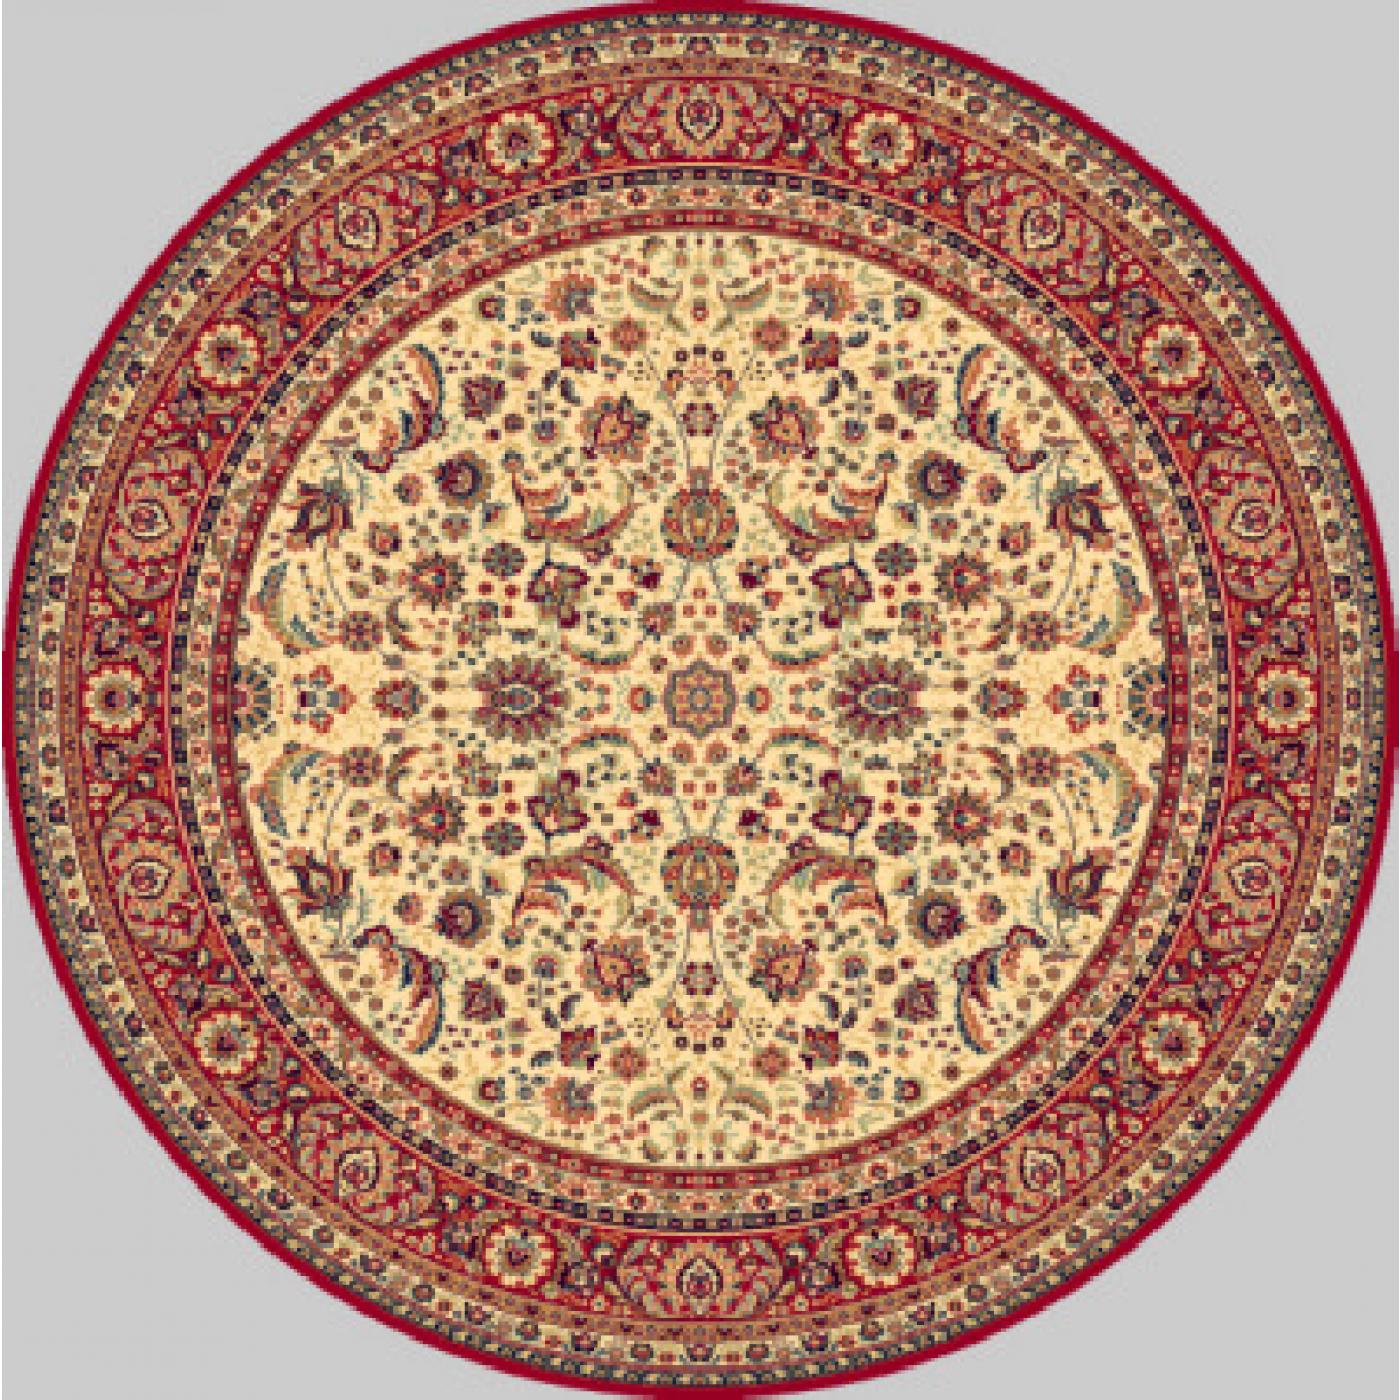 Lano Kasbah S 13720-475 rond